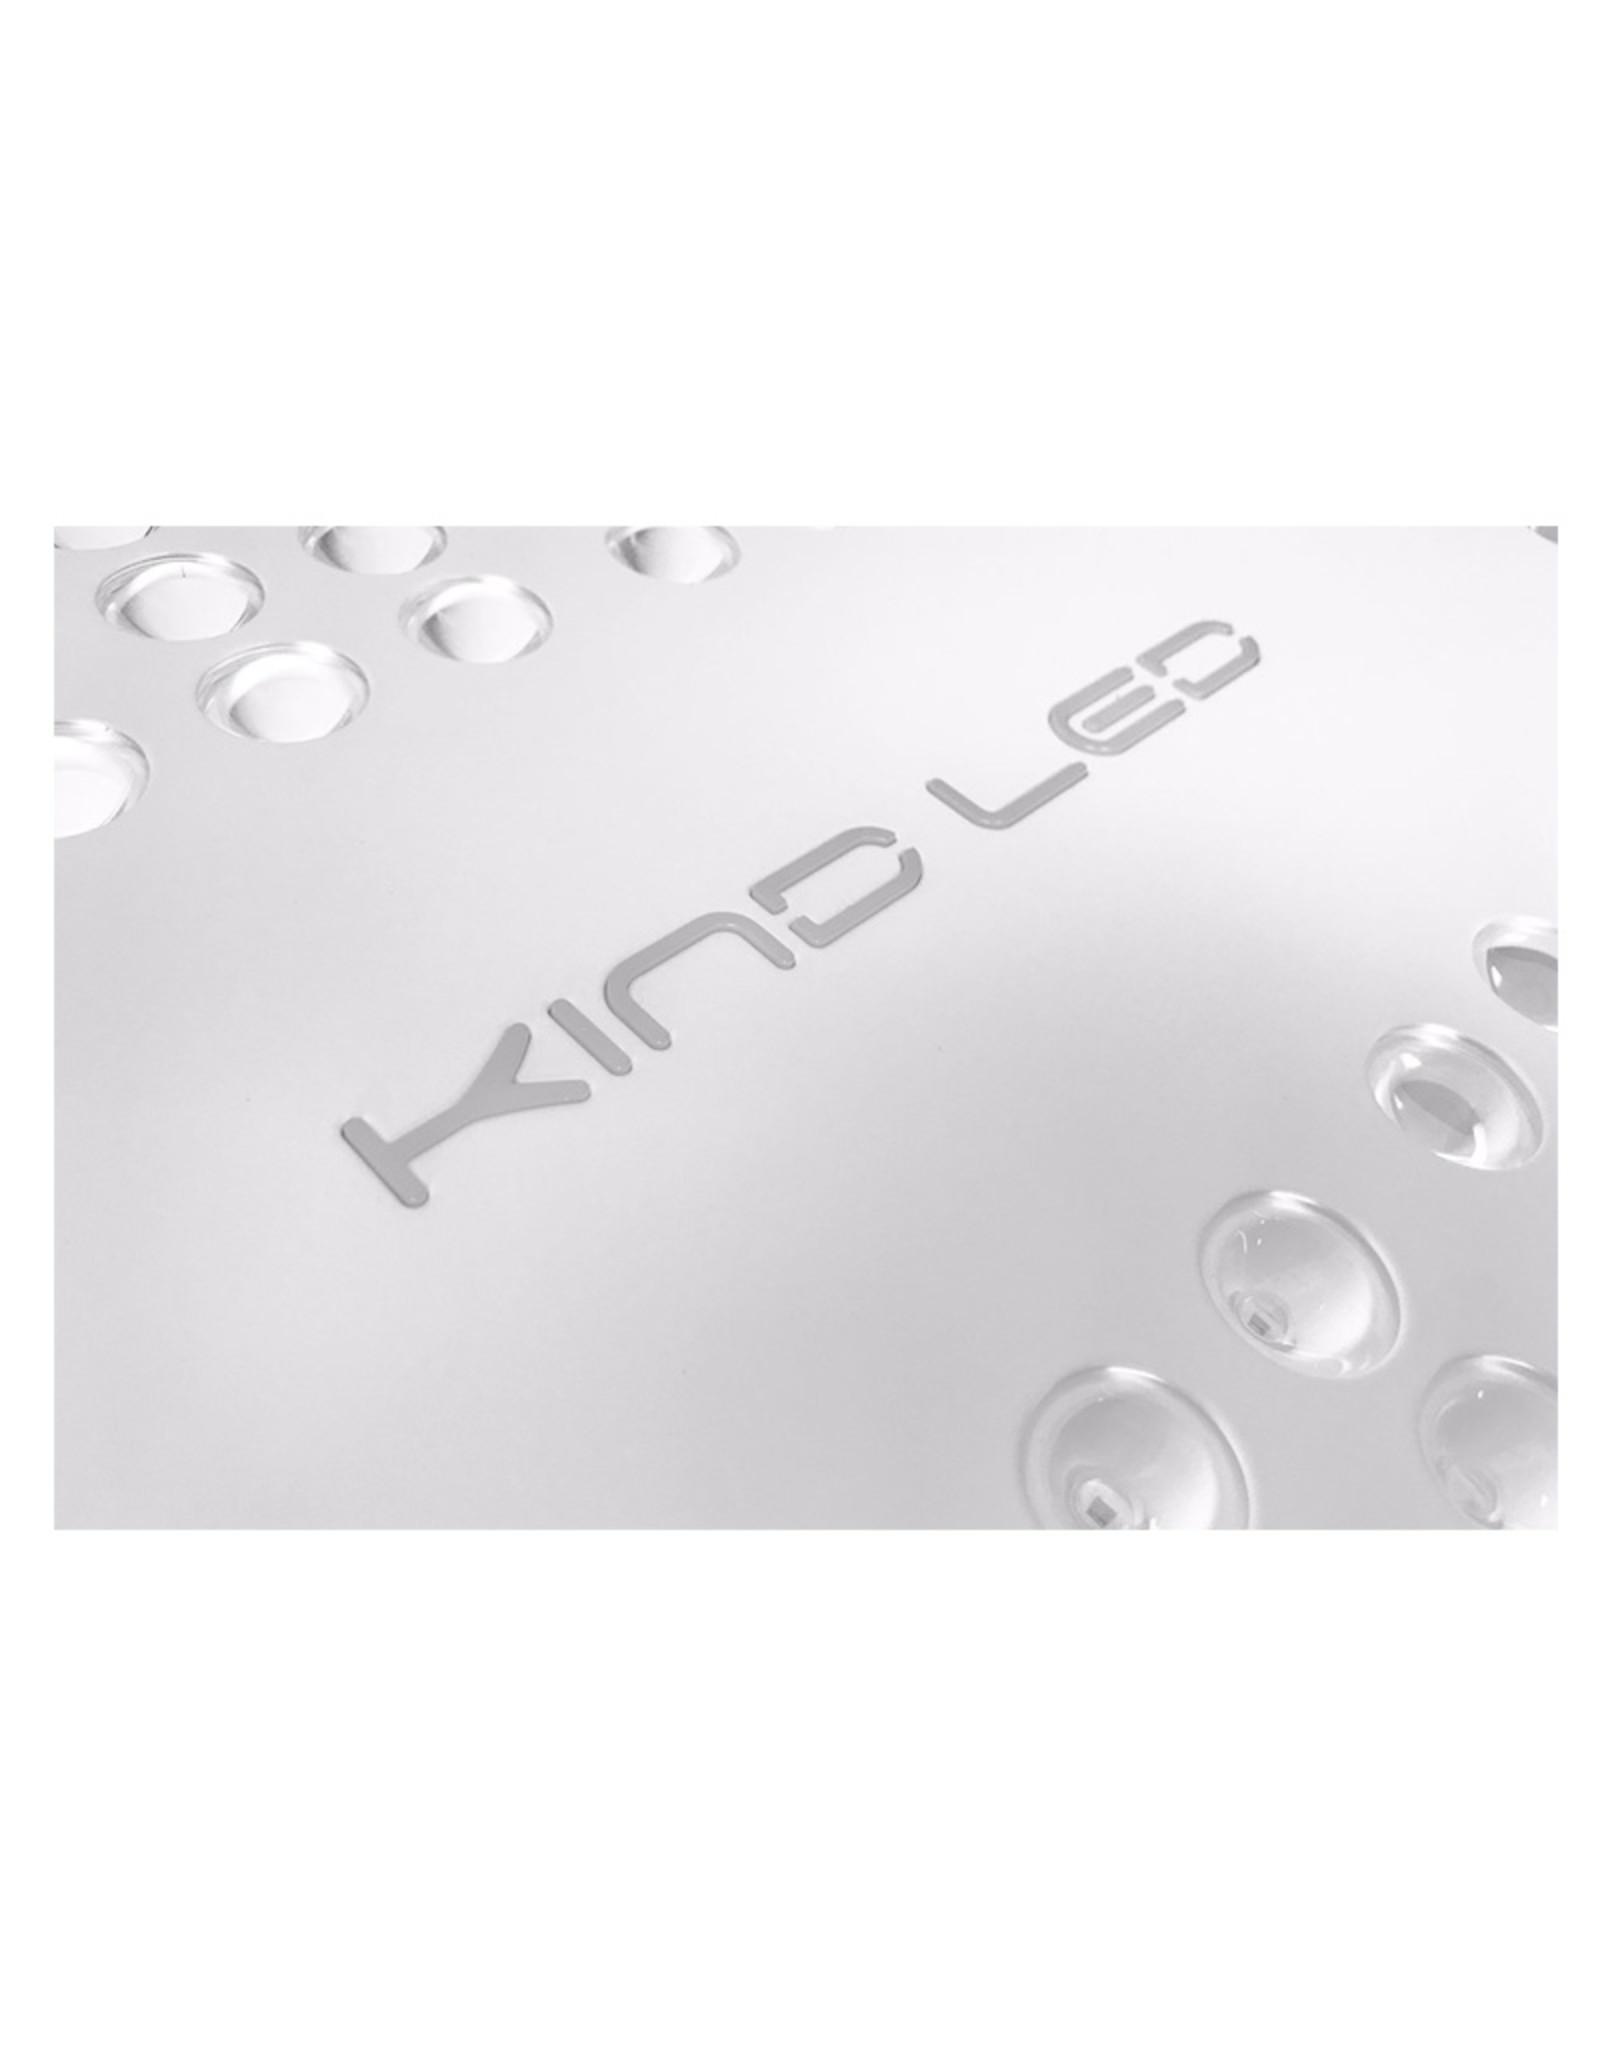 KIND LED KIND LED K3 Series 2 XL 450